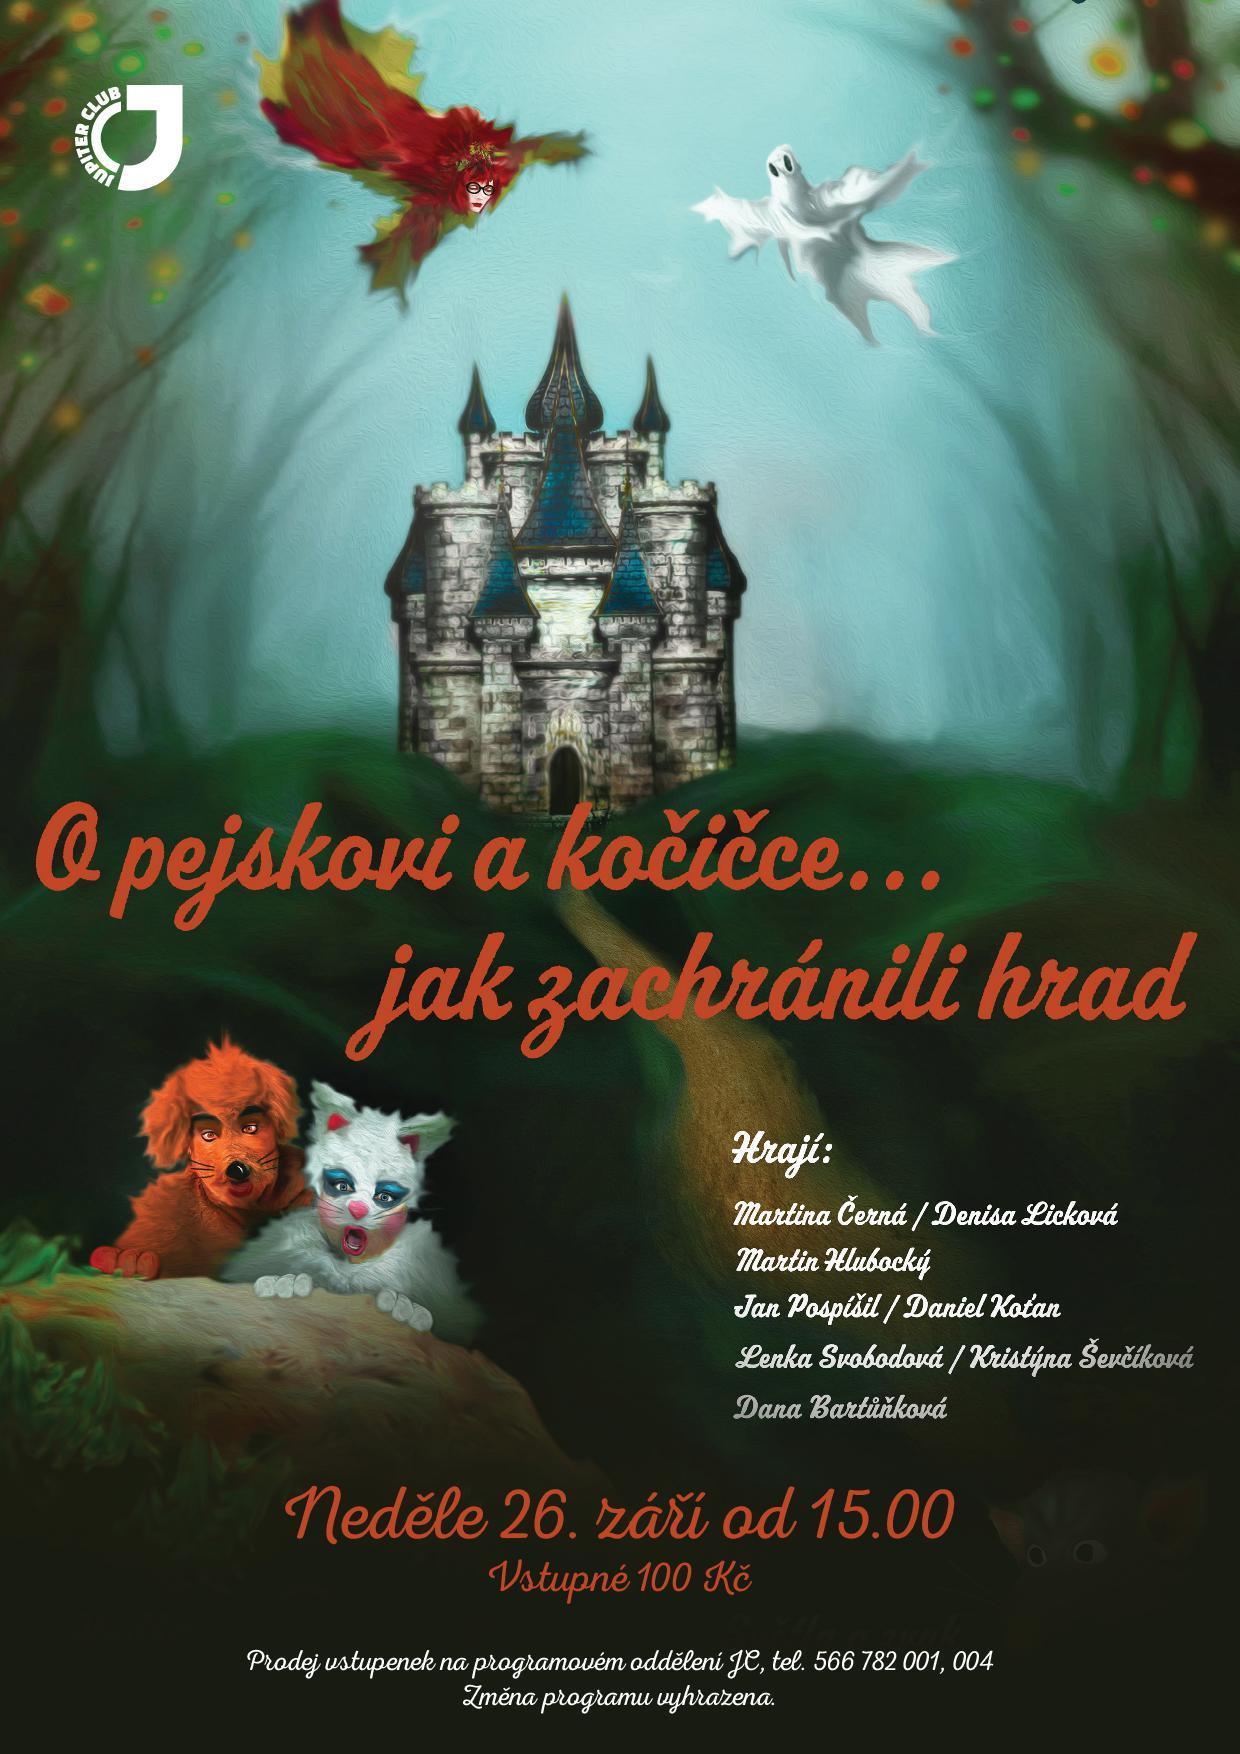 A4 poster pejsek kocicka hrad